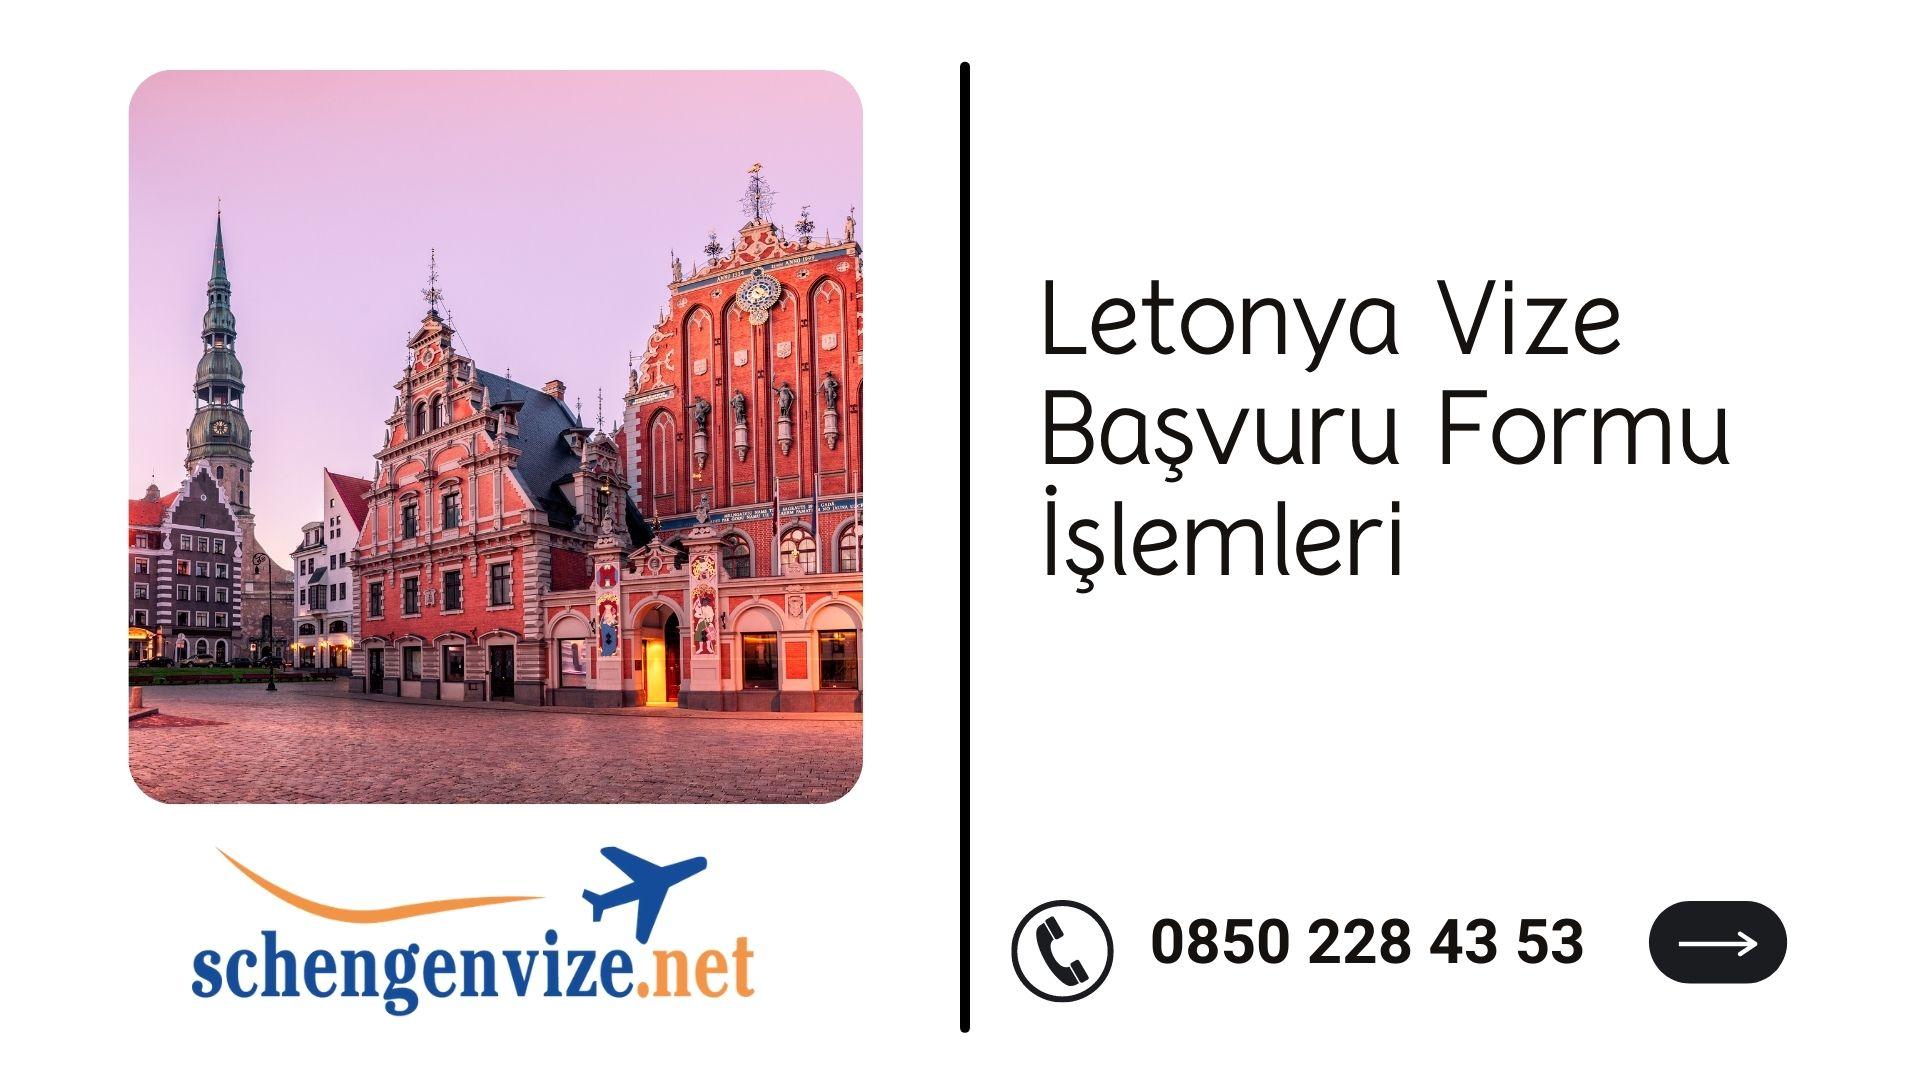 Letonya Vize Başvuru Formu İşlemleri